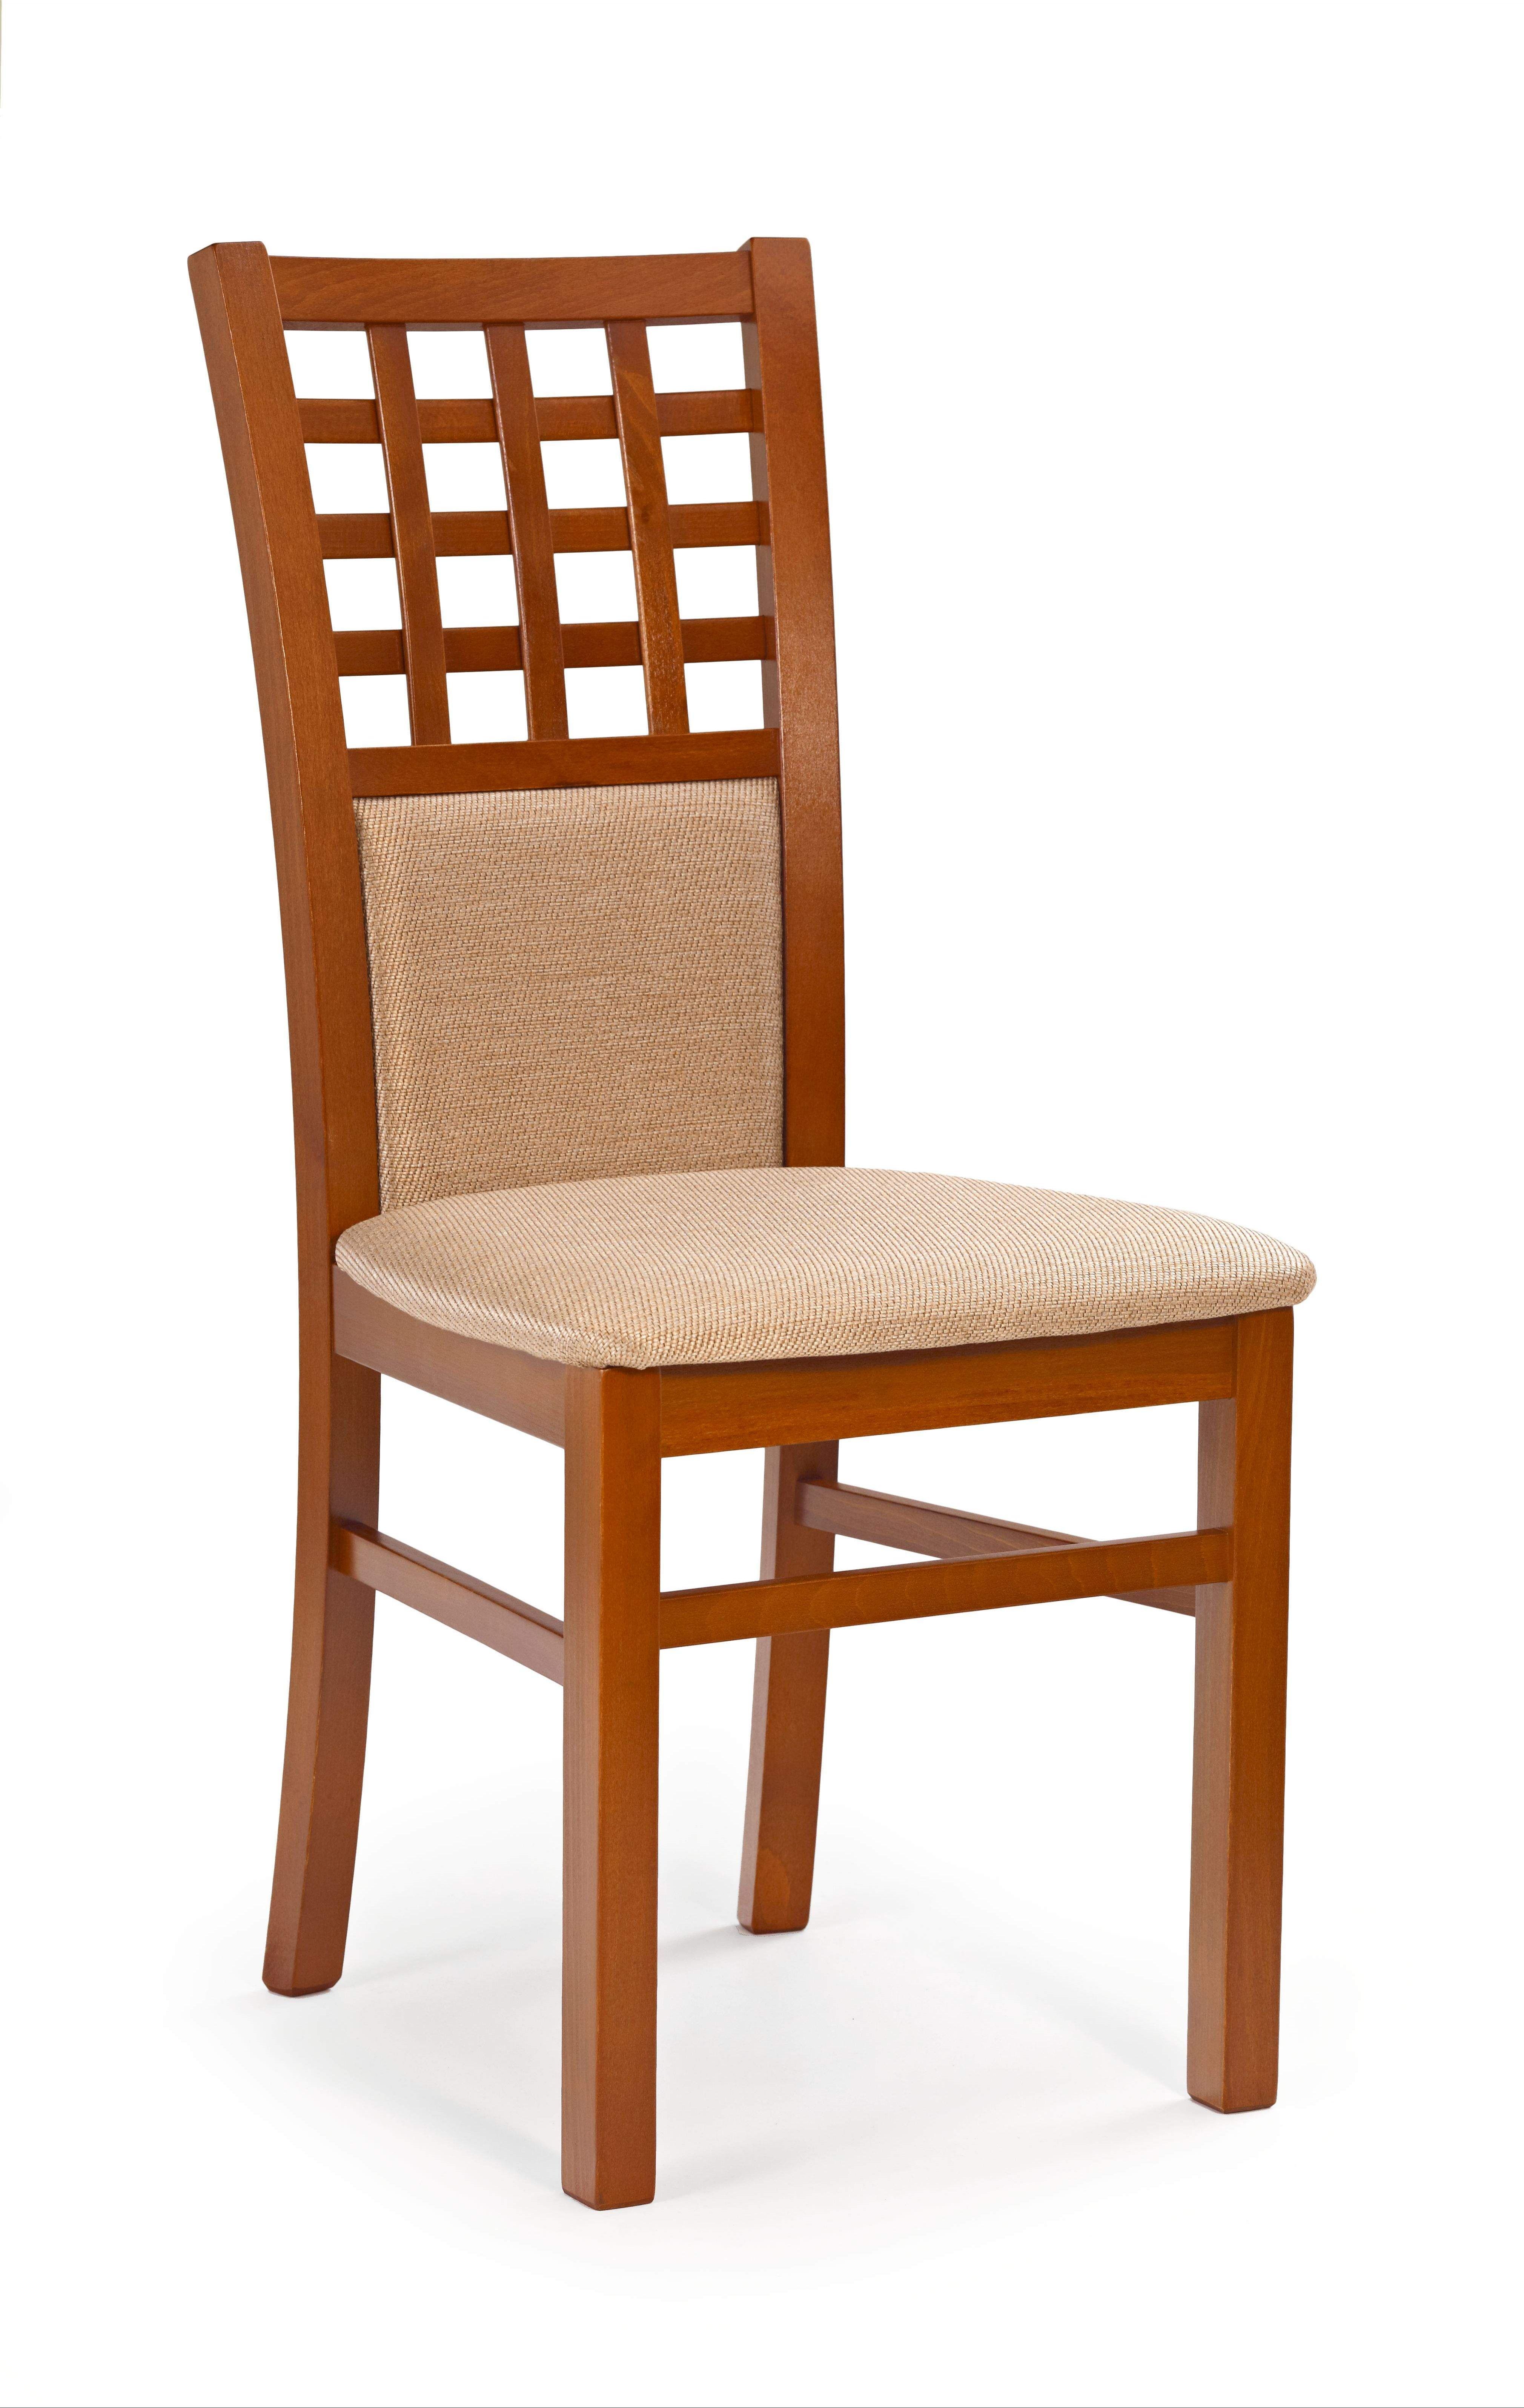 Kėdė GERARD 3 vyšnia